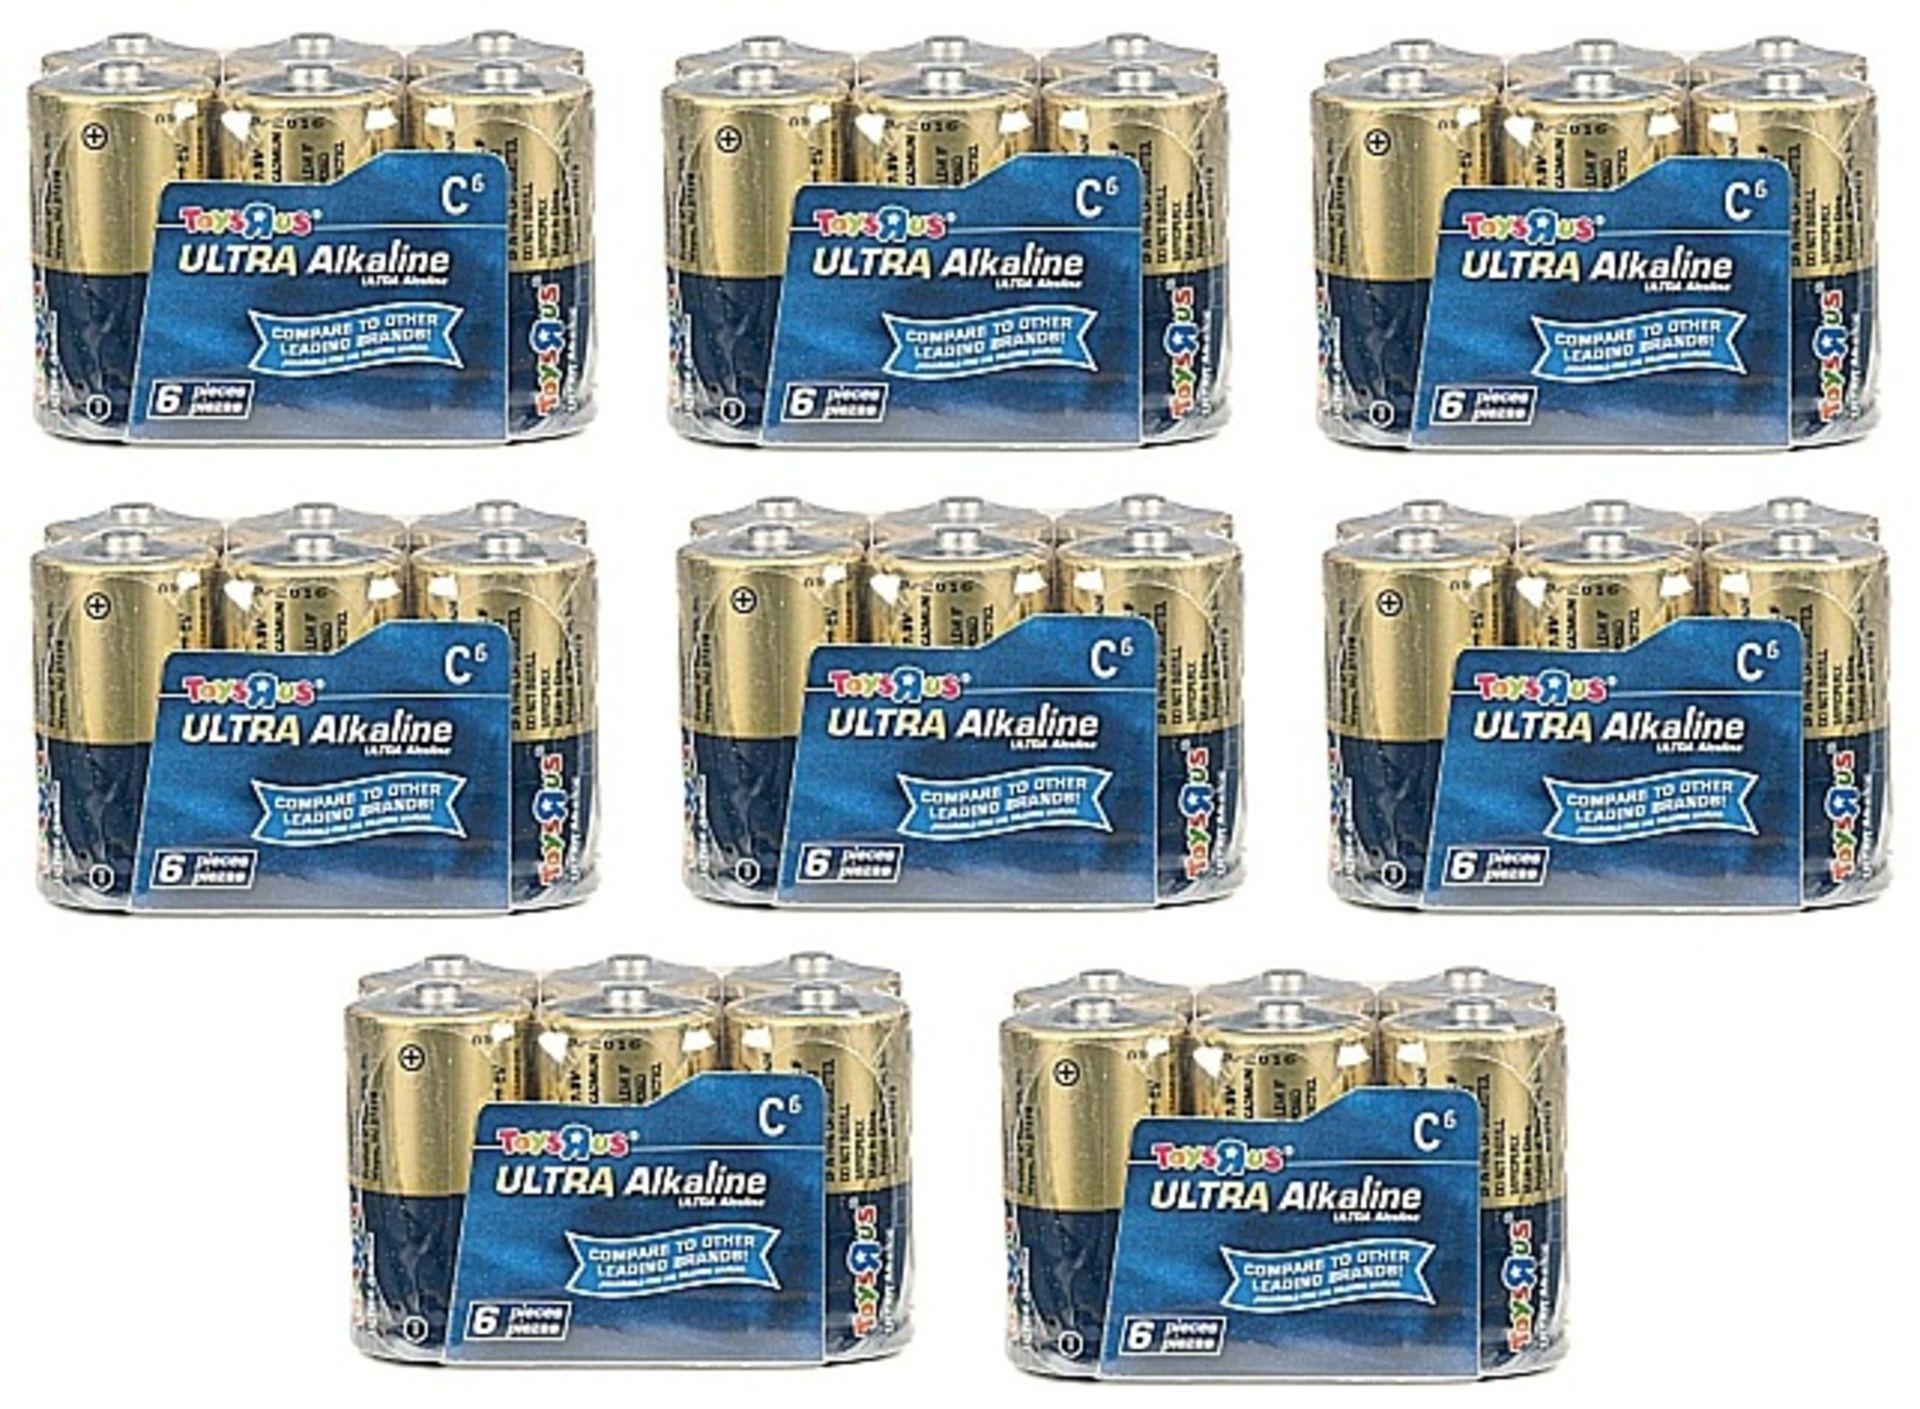 Lot 10220 - V Brand New 48x Ultra Alkaline C Cell LR14 Batteries